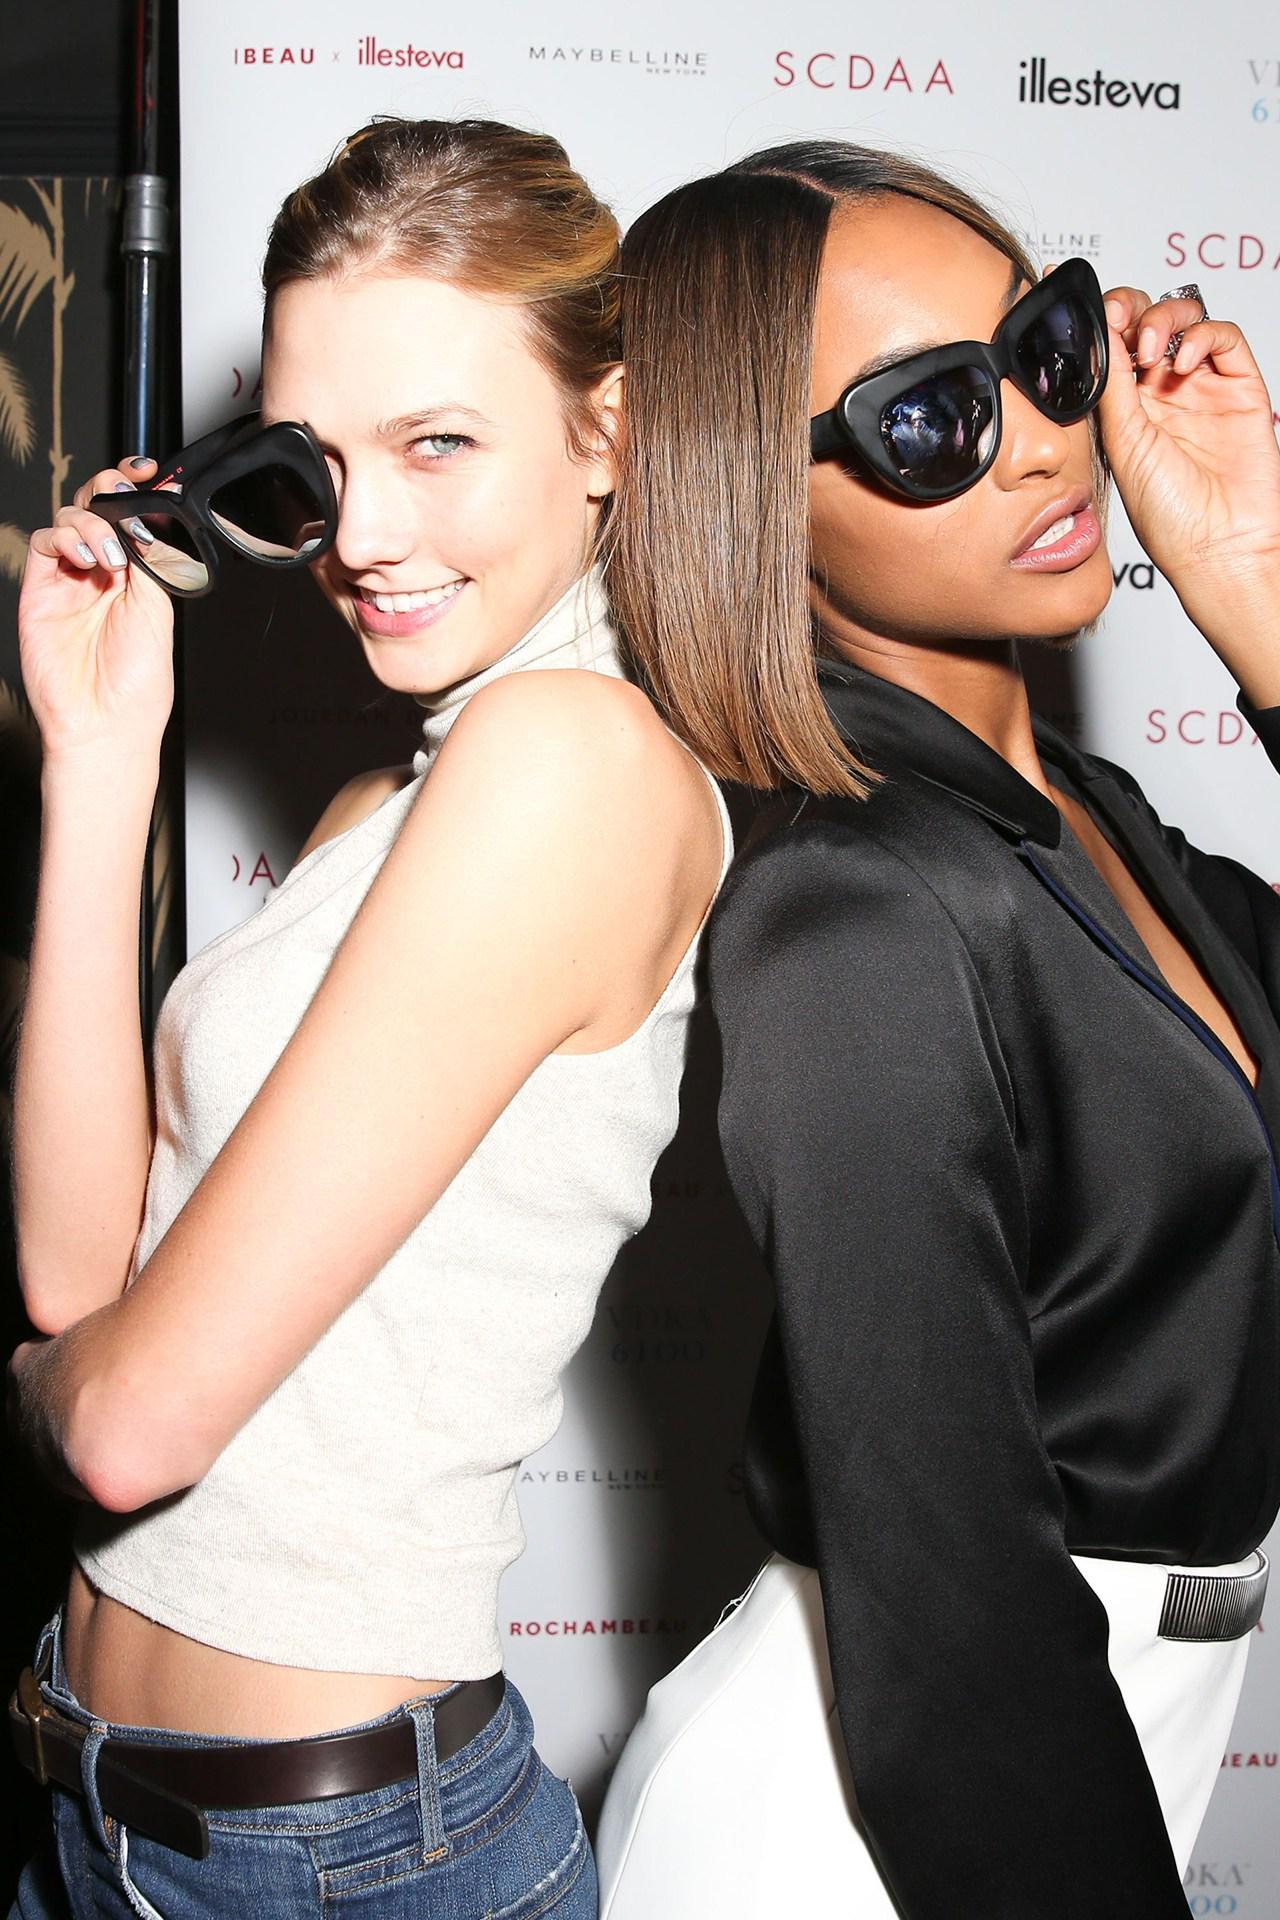 As they celebrate their birthdays, see @karliekloss and @missjourdandunn's BFF model moments http://t.co/25ZAhUG3vE http://t.co/I64XhVVgsy